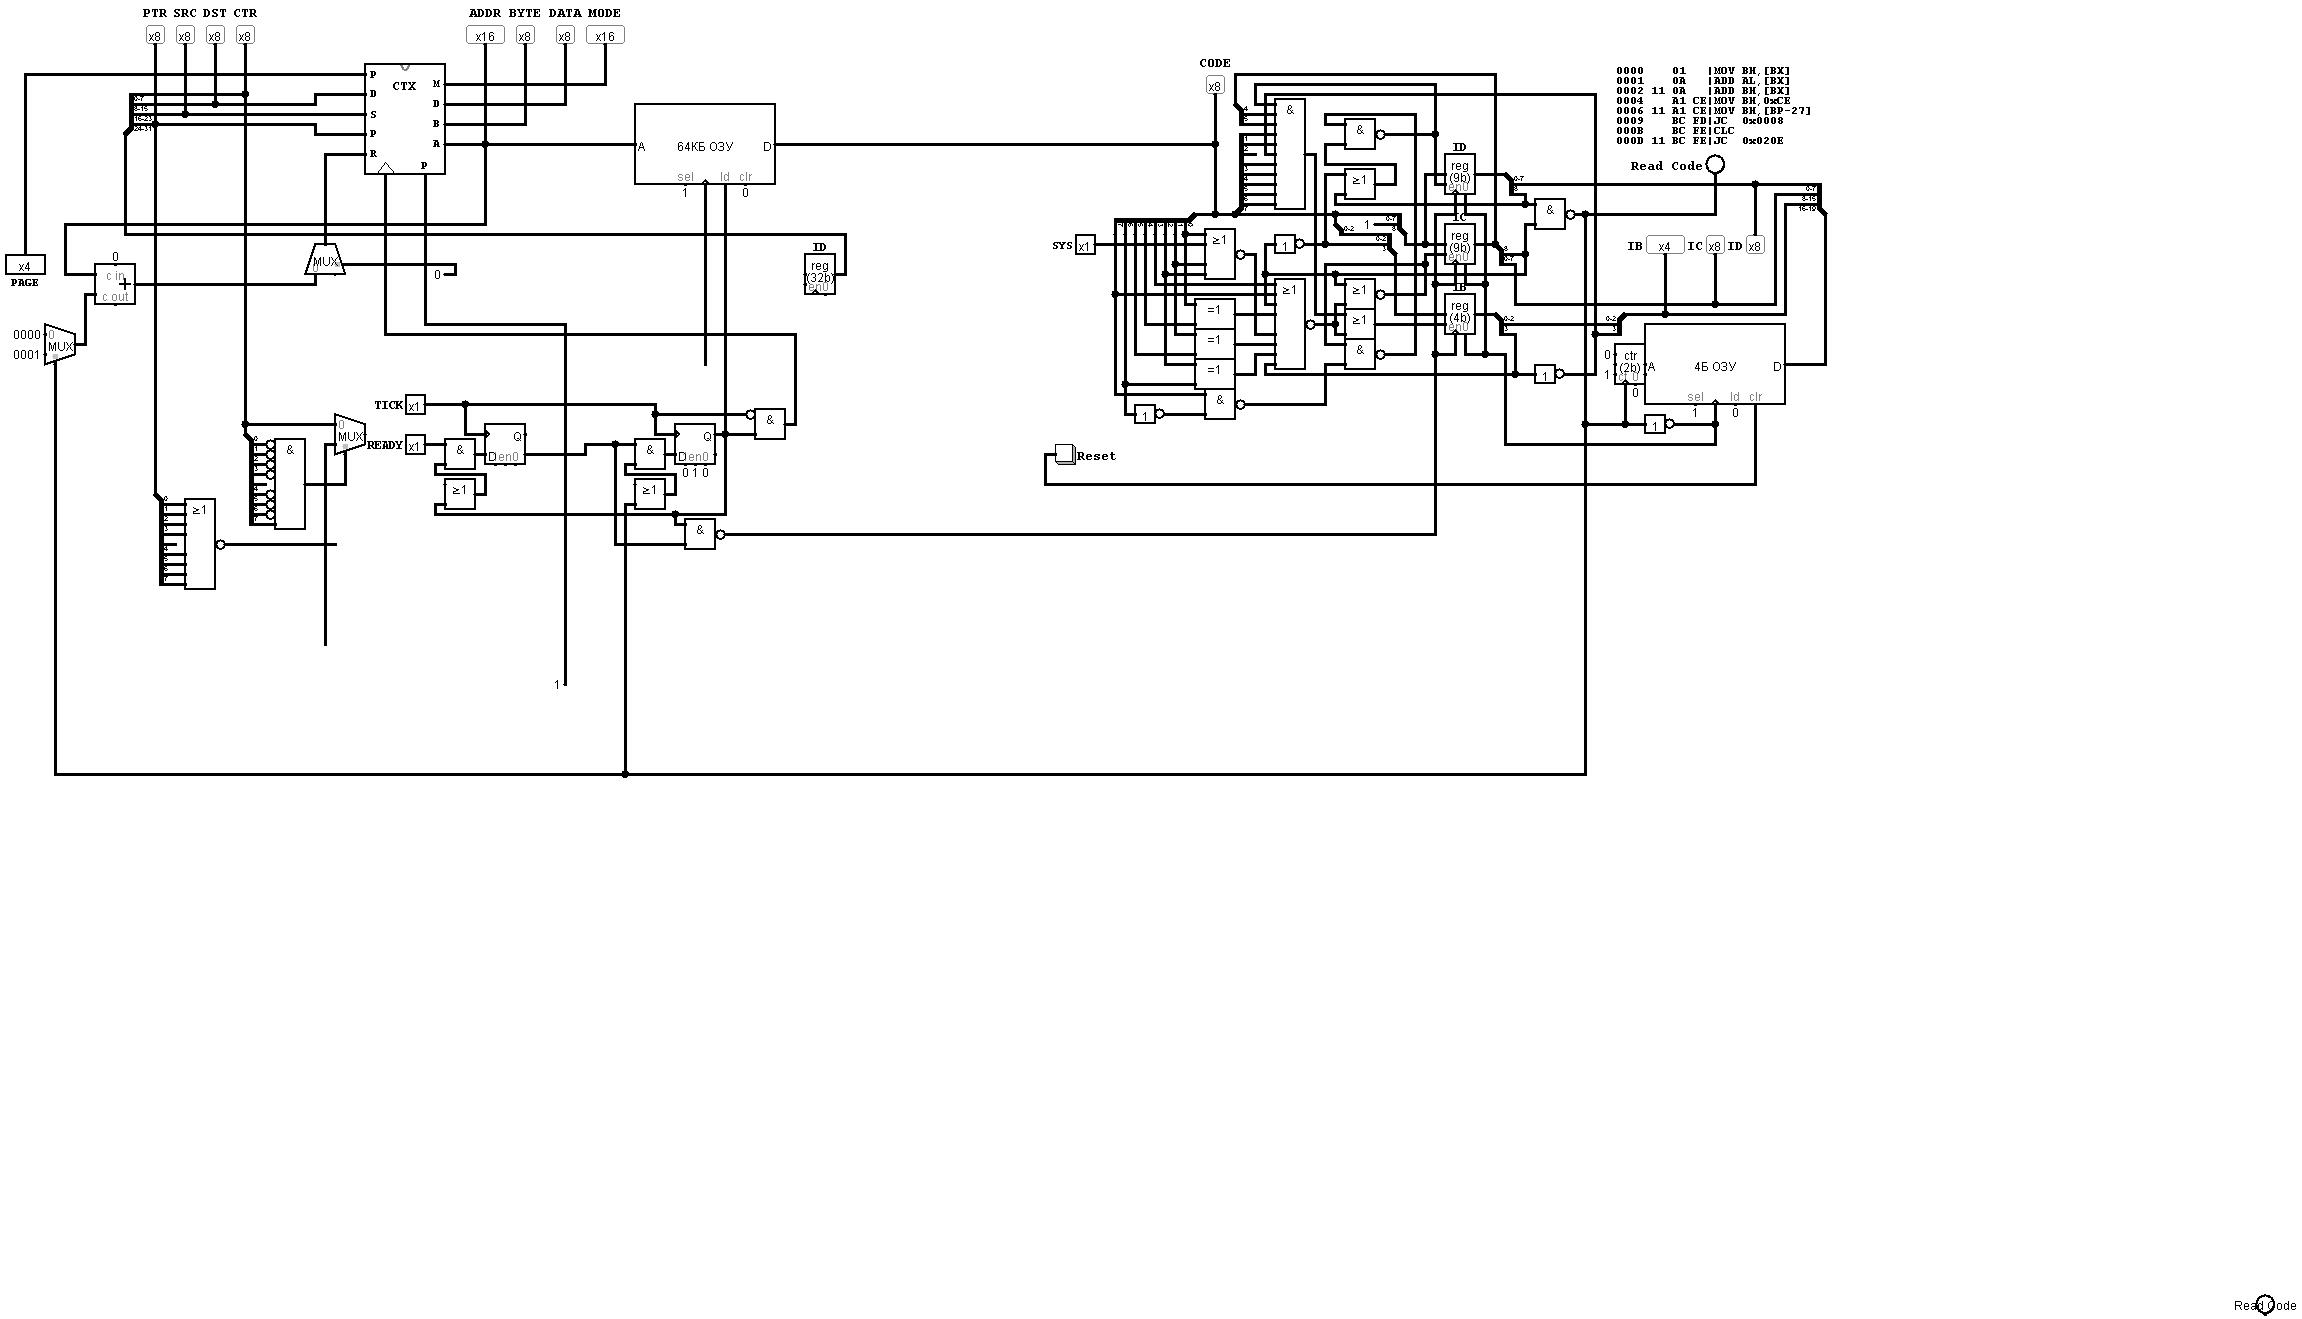 x80 - читалка команд из ОЗУ | ❌80: Тёплый ламповый